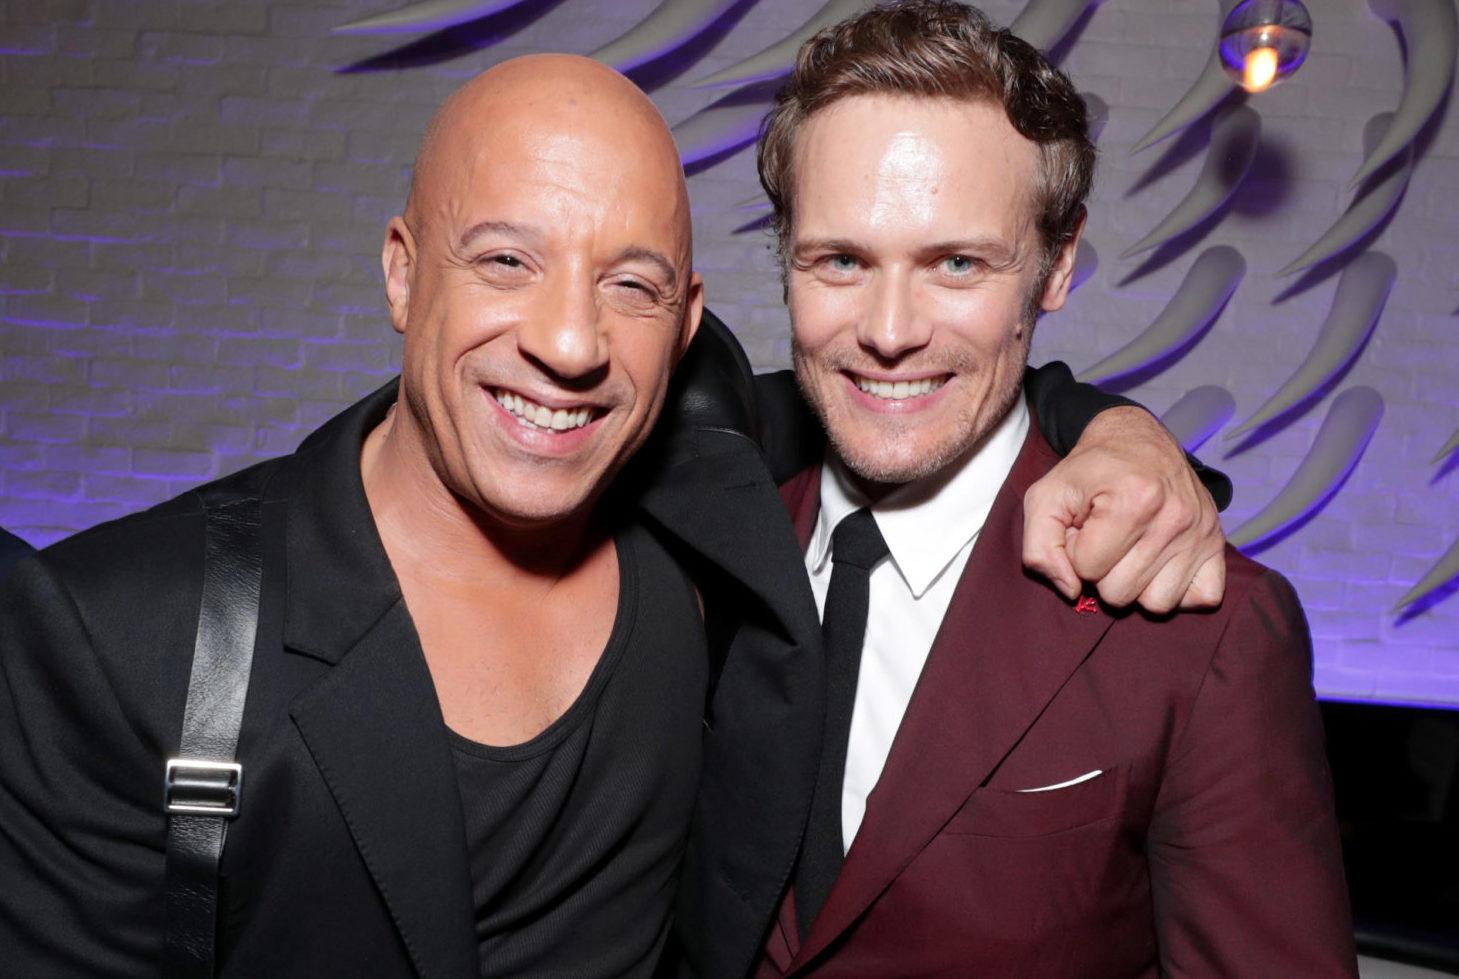 Vin Diesel and Bloodshot co-star Sam Heughan